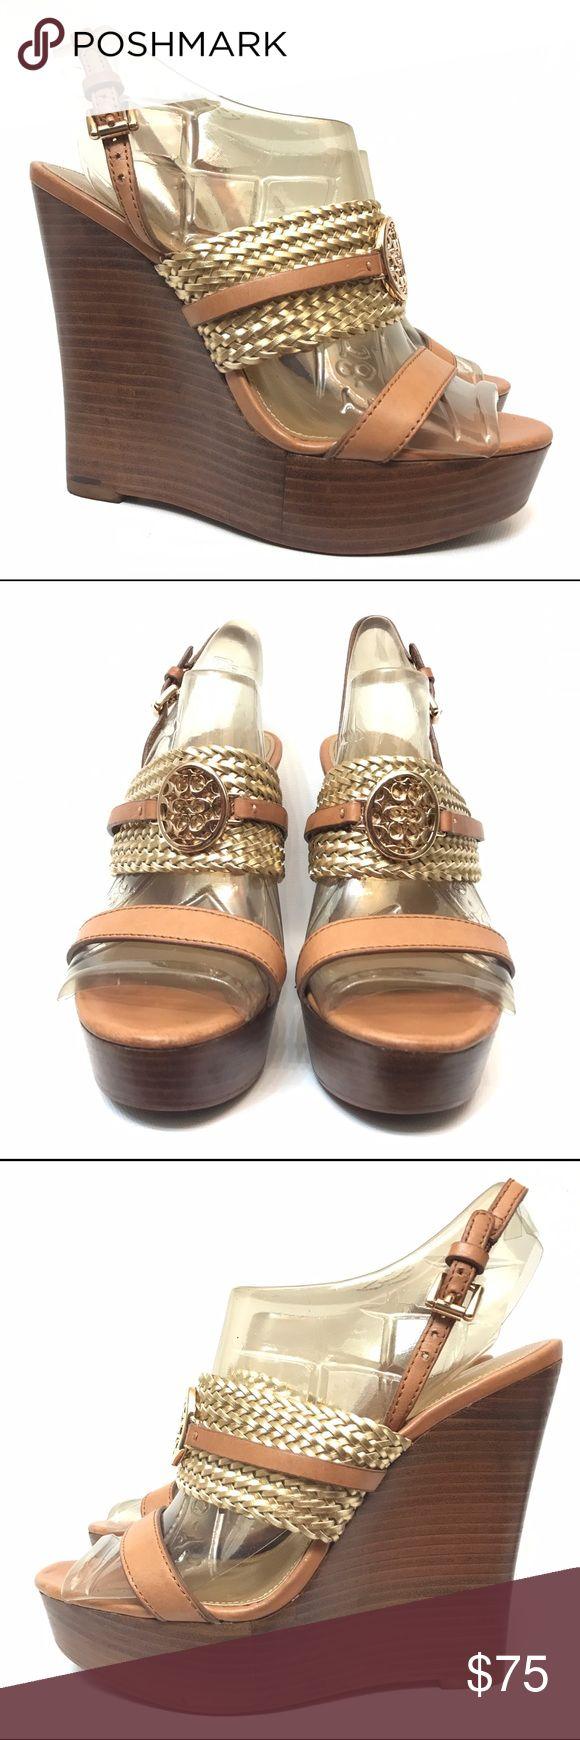 Coach wedge sandals 6 ankle strap tan high heels Platform Gold Logo Coach Shoes Heels #tananklestrapsheels